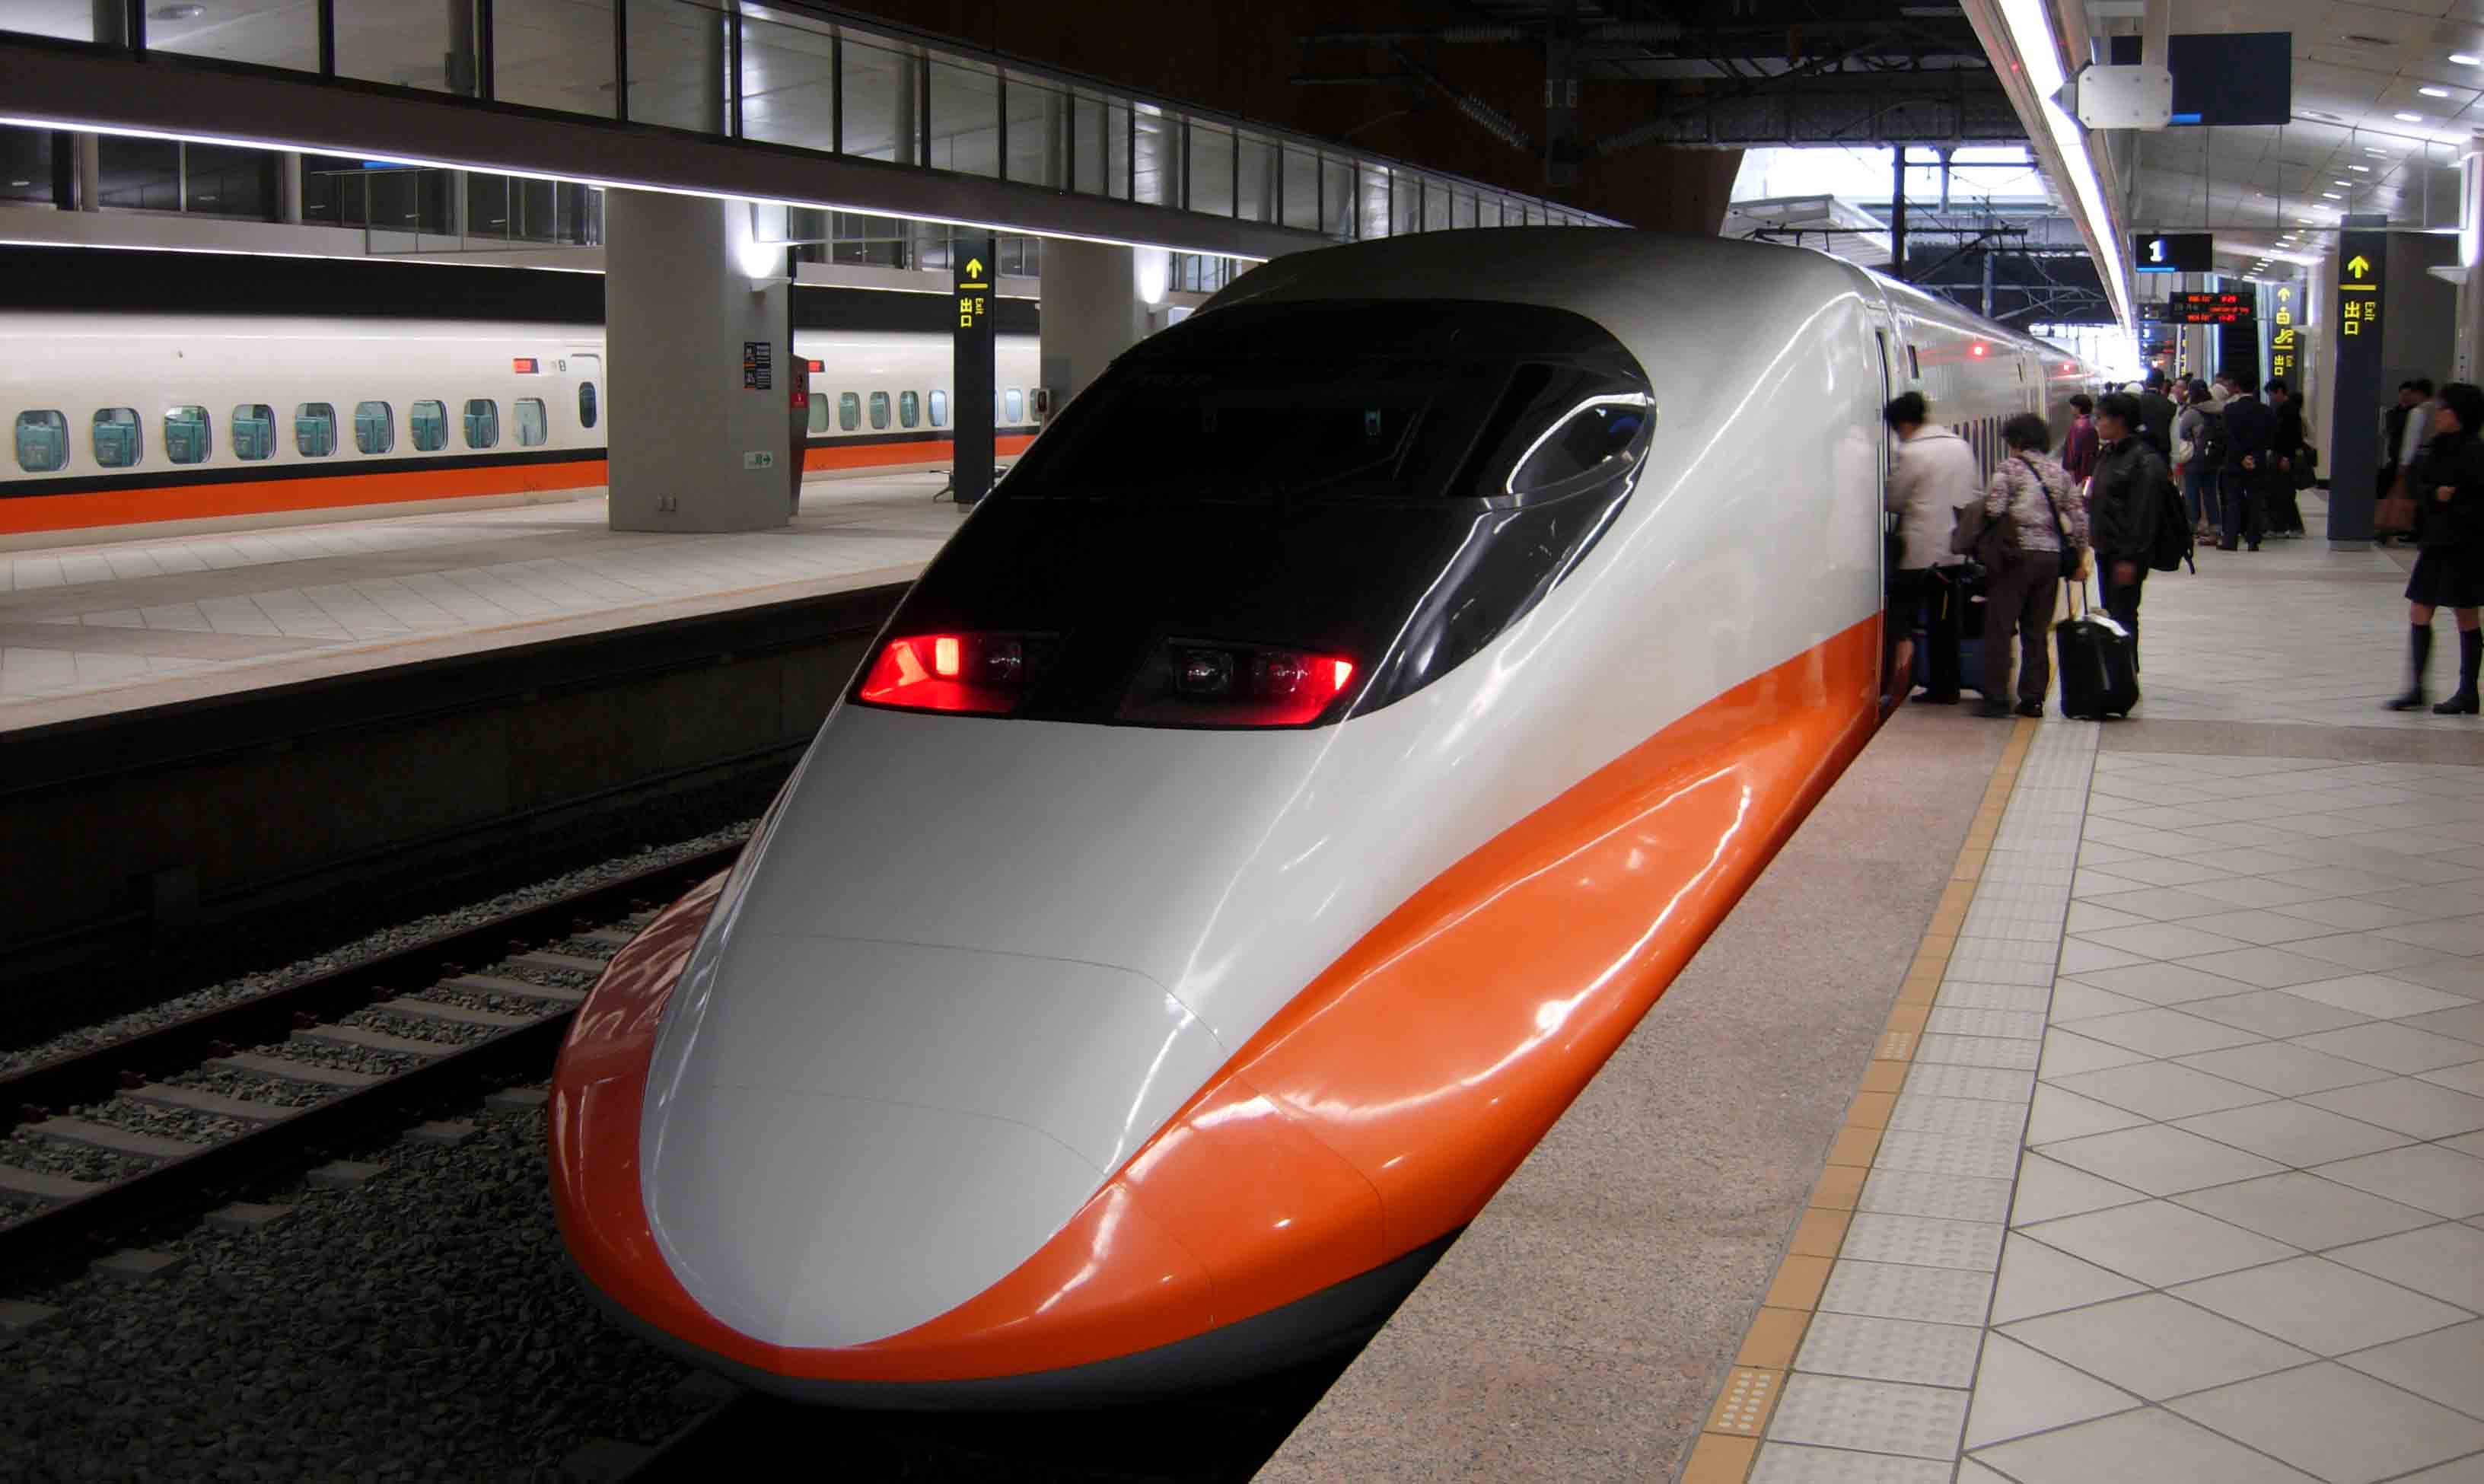 HSR_Zuoying_Station_edit